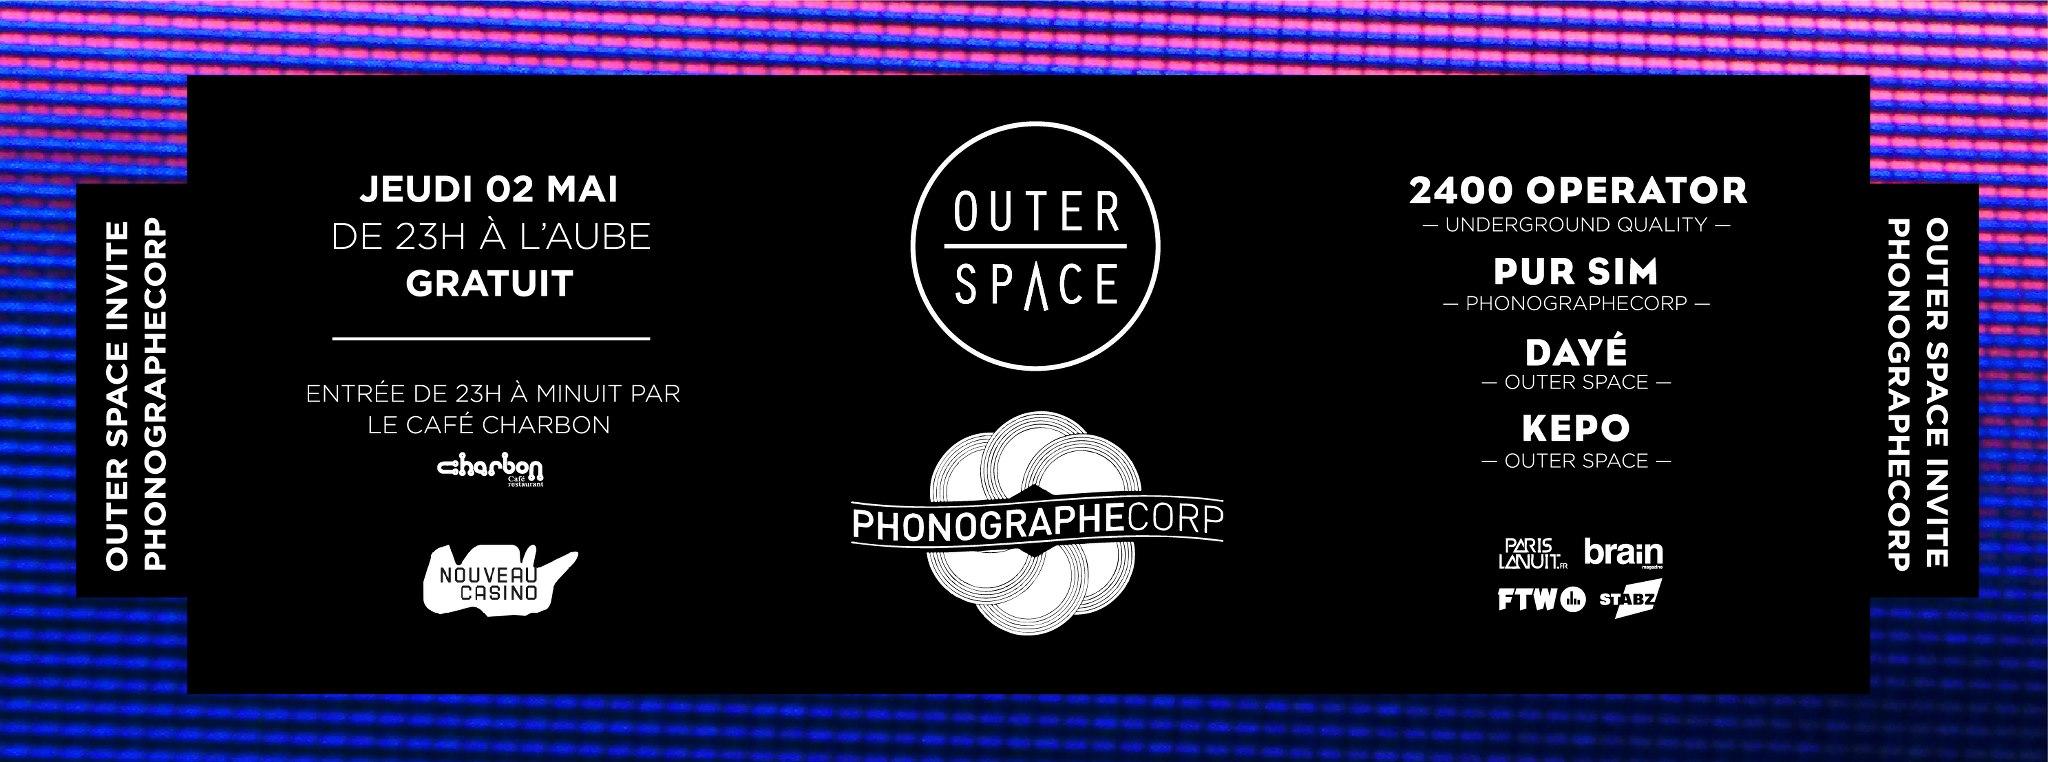 Outer Space invite Phonographe Corp @ Nouveau Casino (3.05.2013)